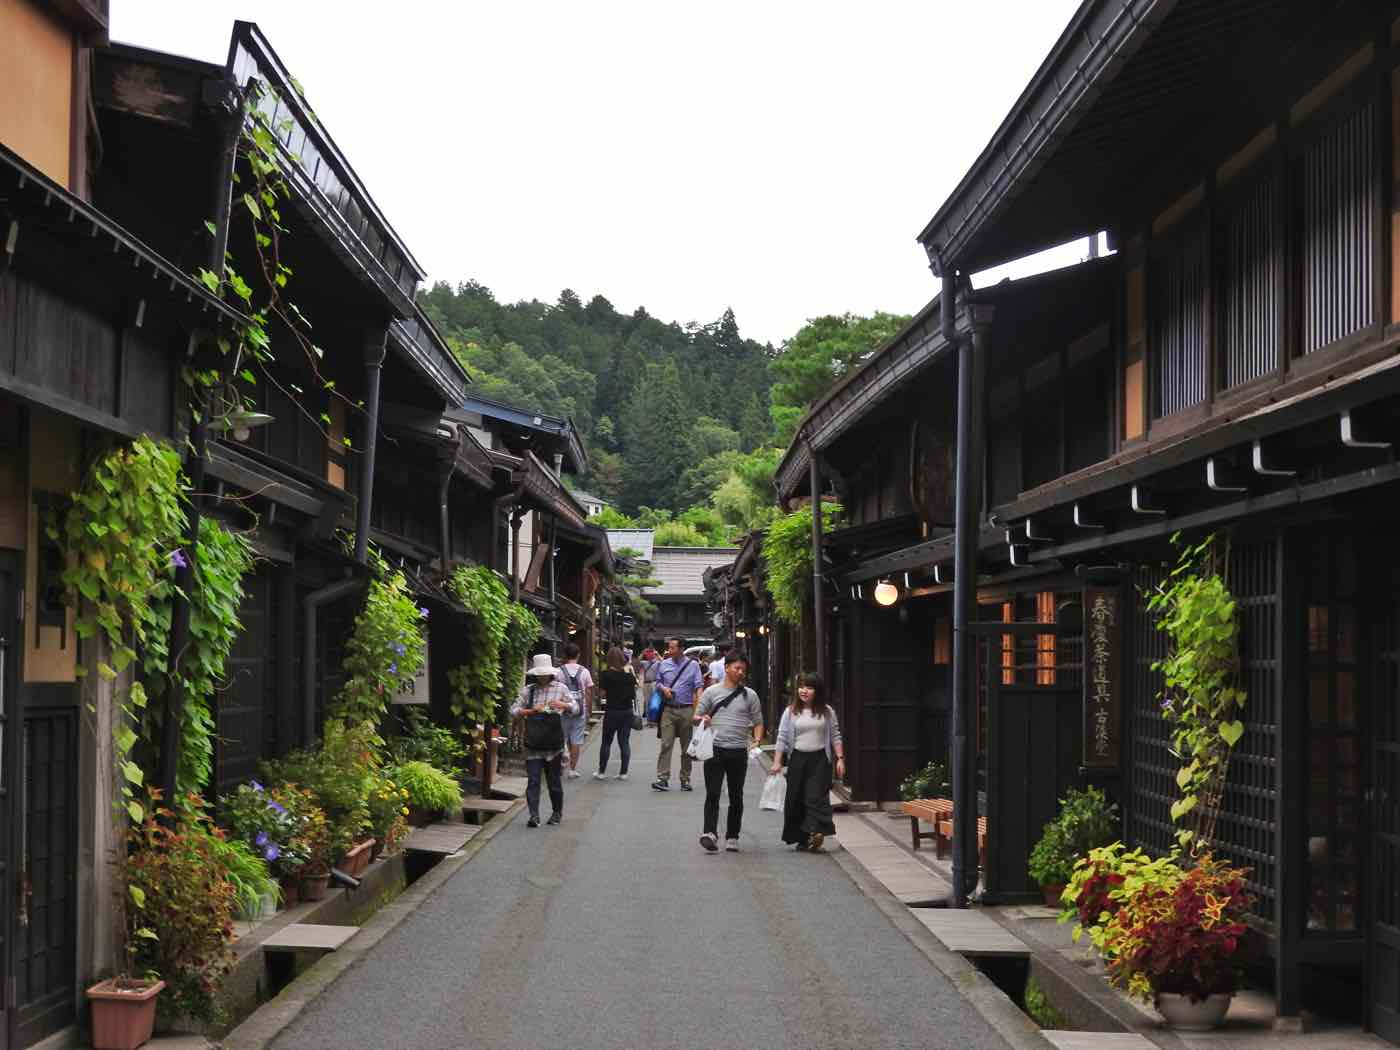 japan itinerary 14 days takayama old town